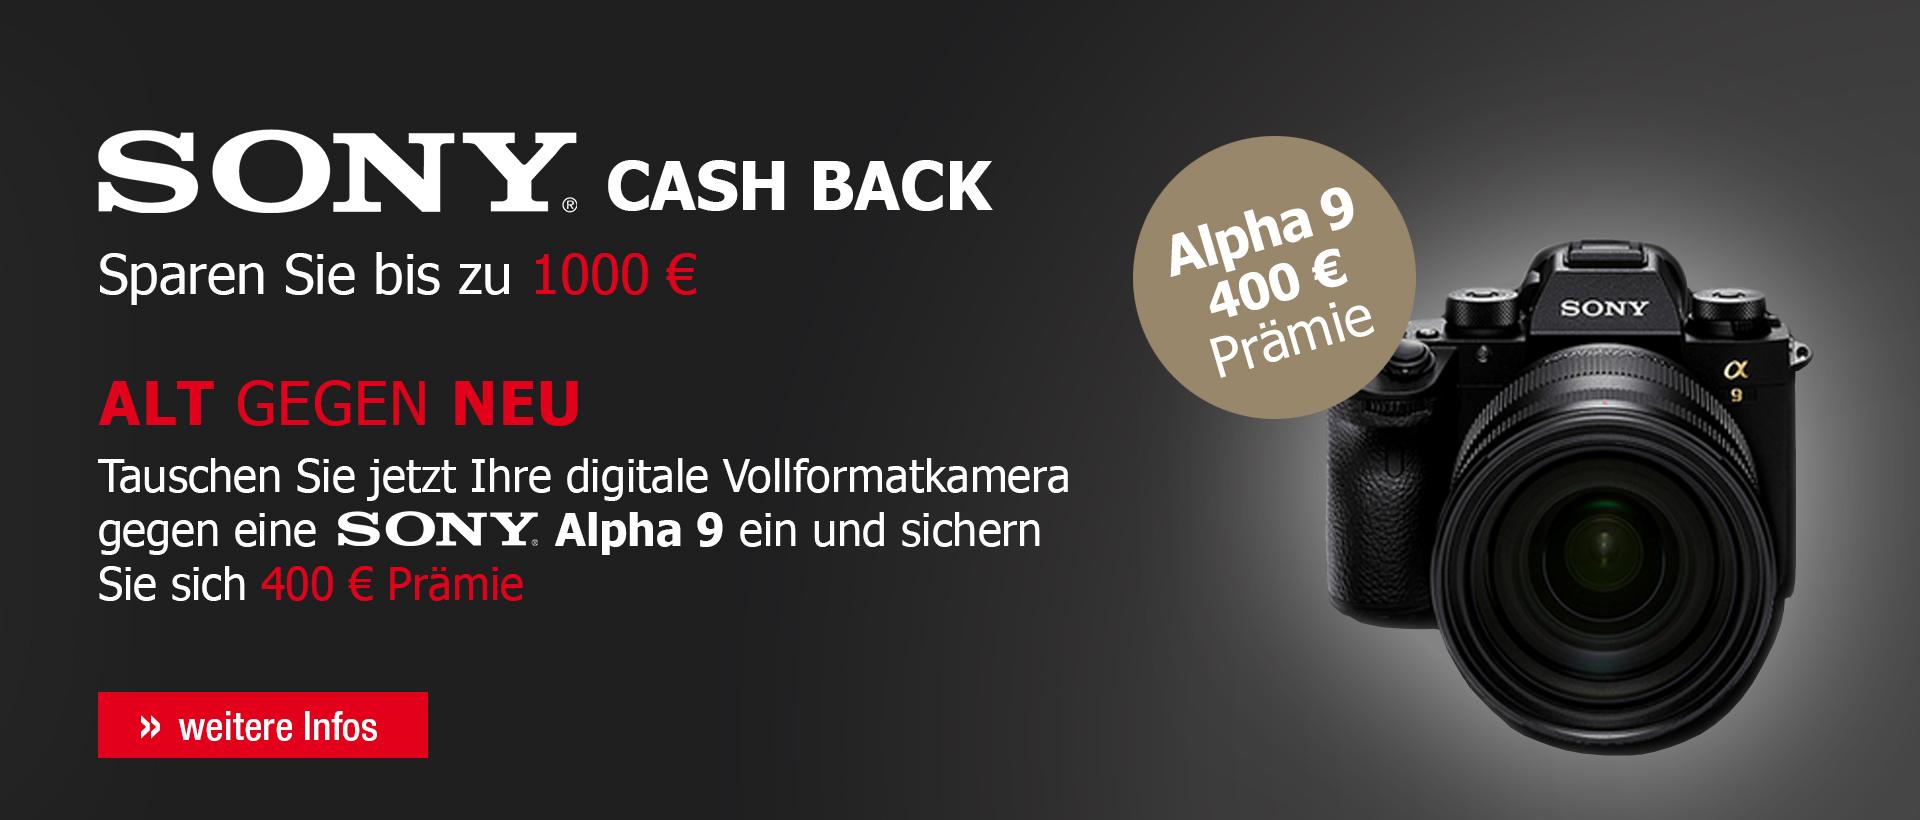 SONY Cashback - Photohaus.de